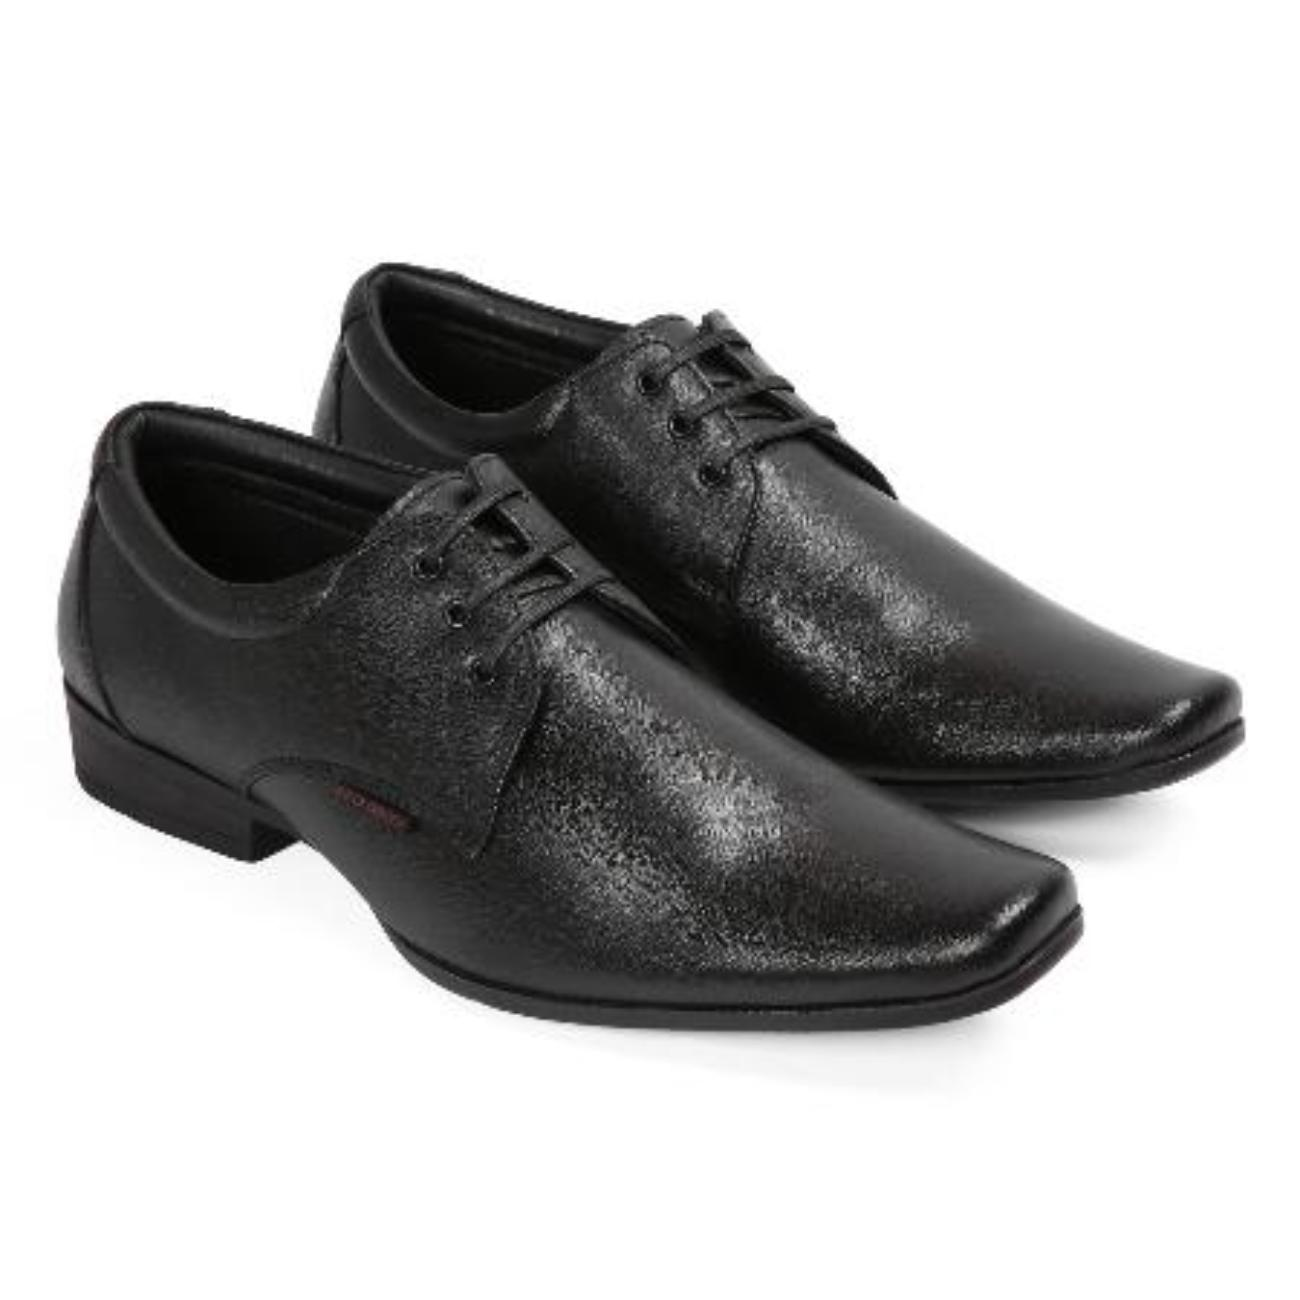 black formal shoes for work